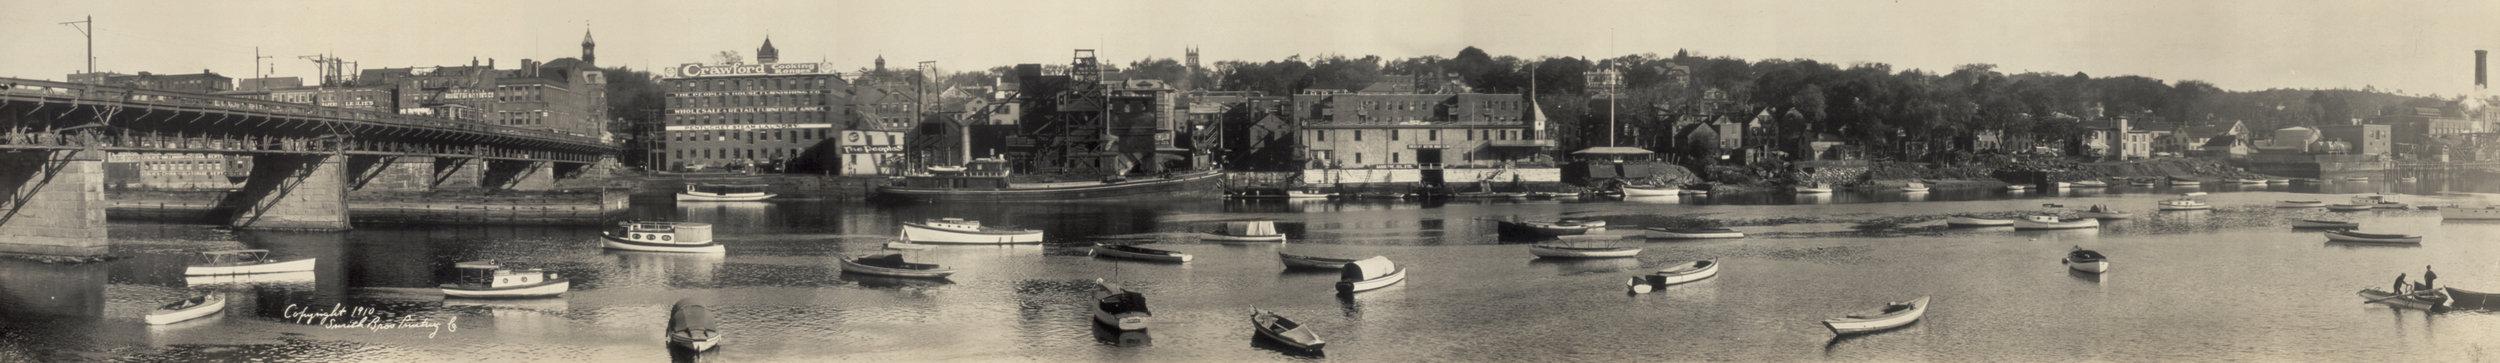 1910_waterfront_haverhill_massachusetts.jpg